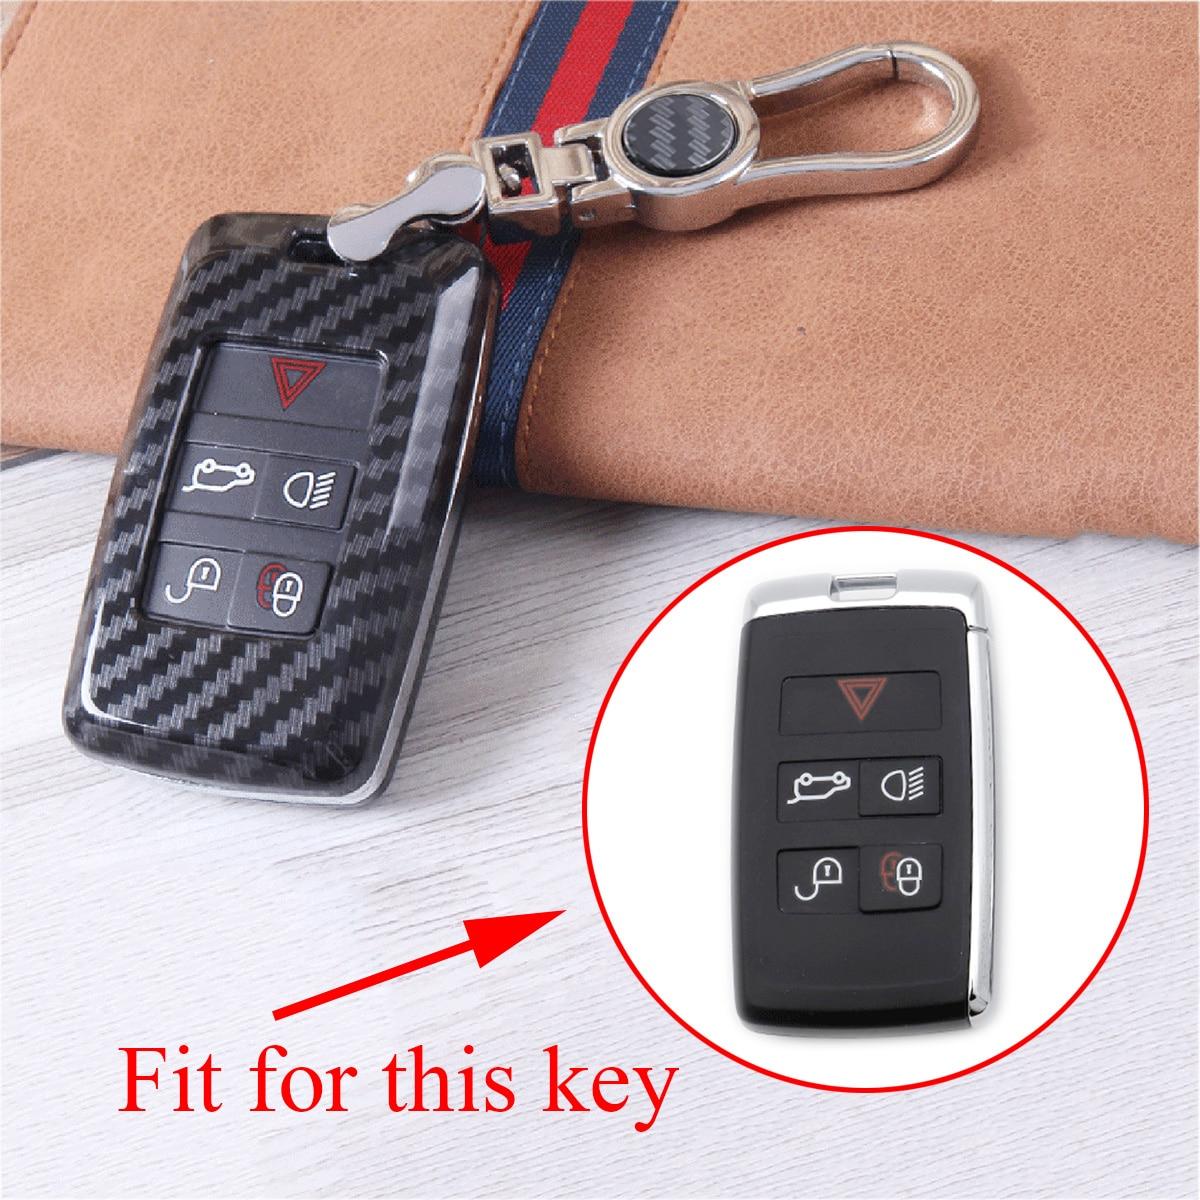 Funda de llave de fibra de carbono adecuada para Range Rover Sport Discovery Sport Discovery4 2018 piezas de carcasa de llave Fob bolsa titular cubierta Accesorios